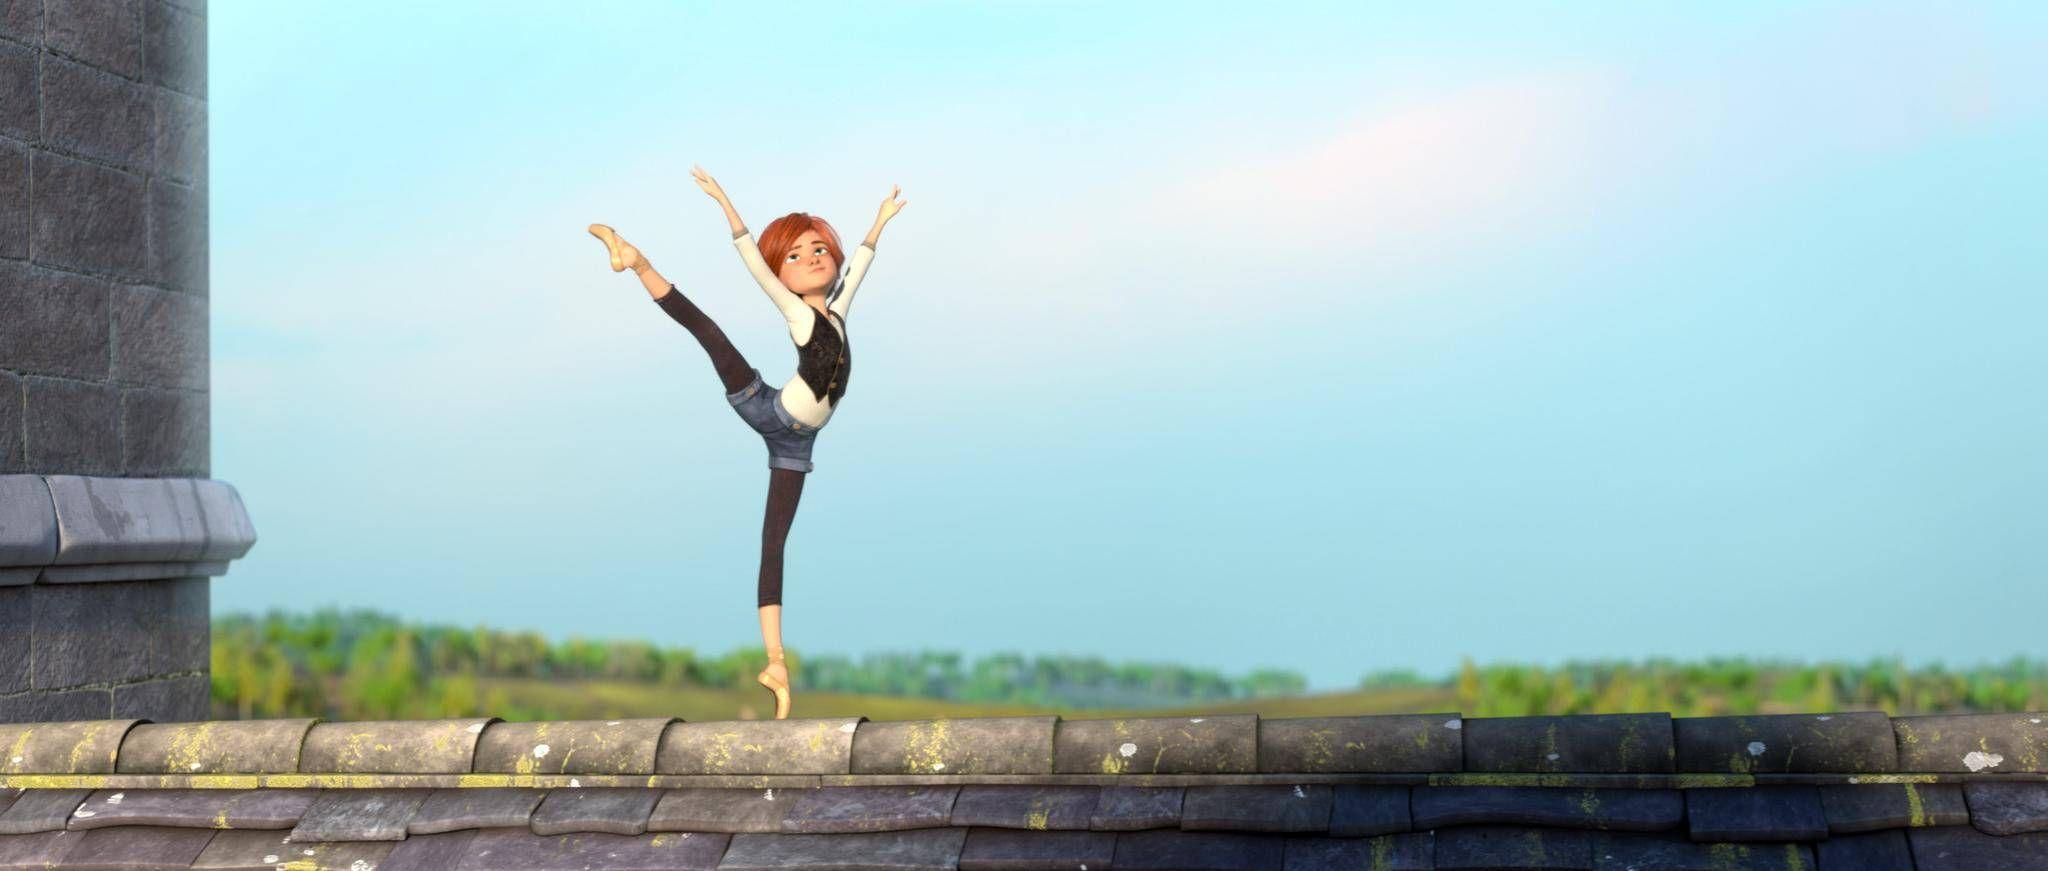 the ballerina 2017 horror movie review